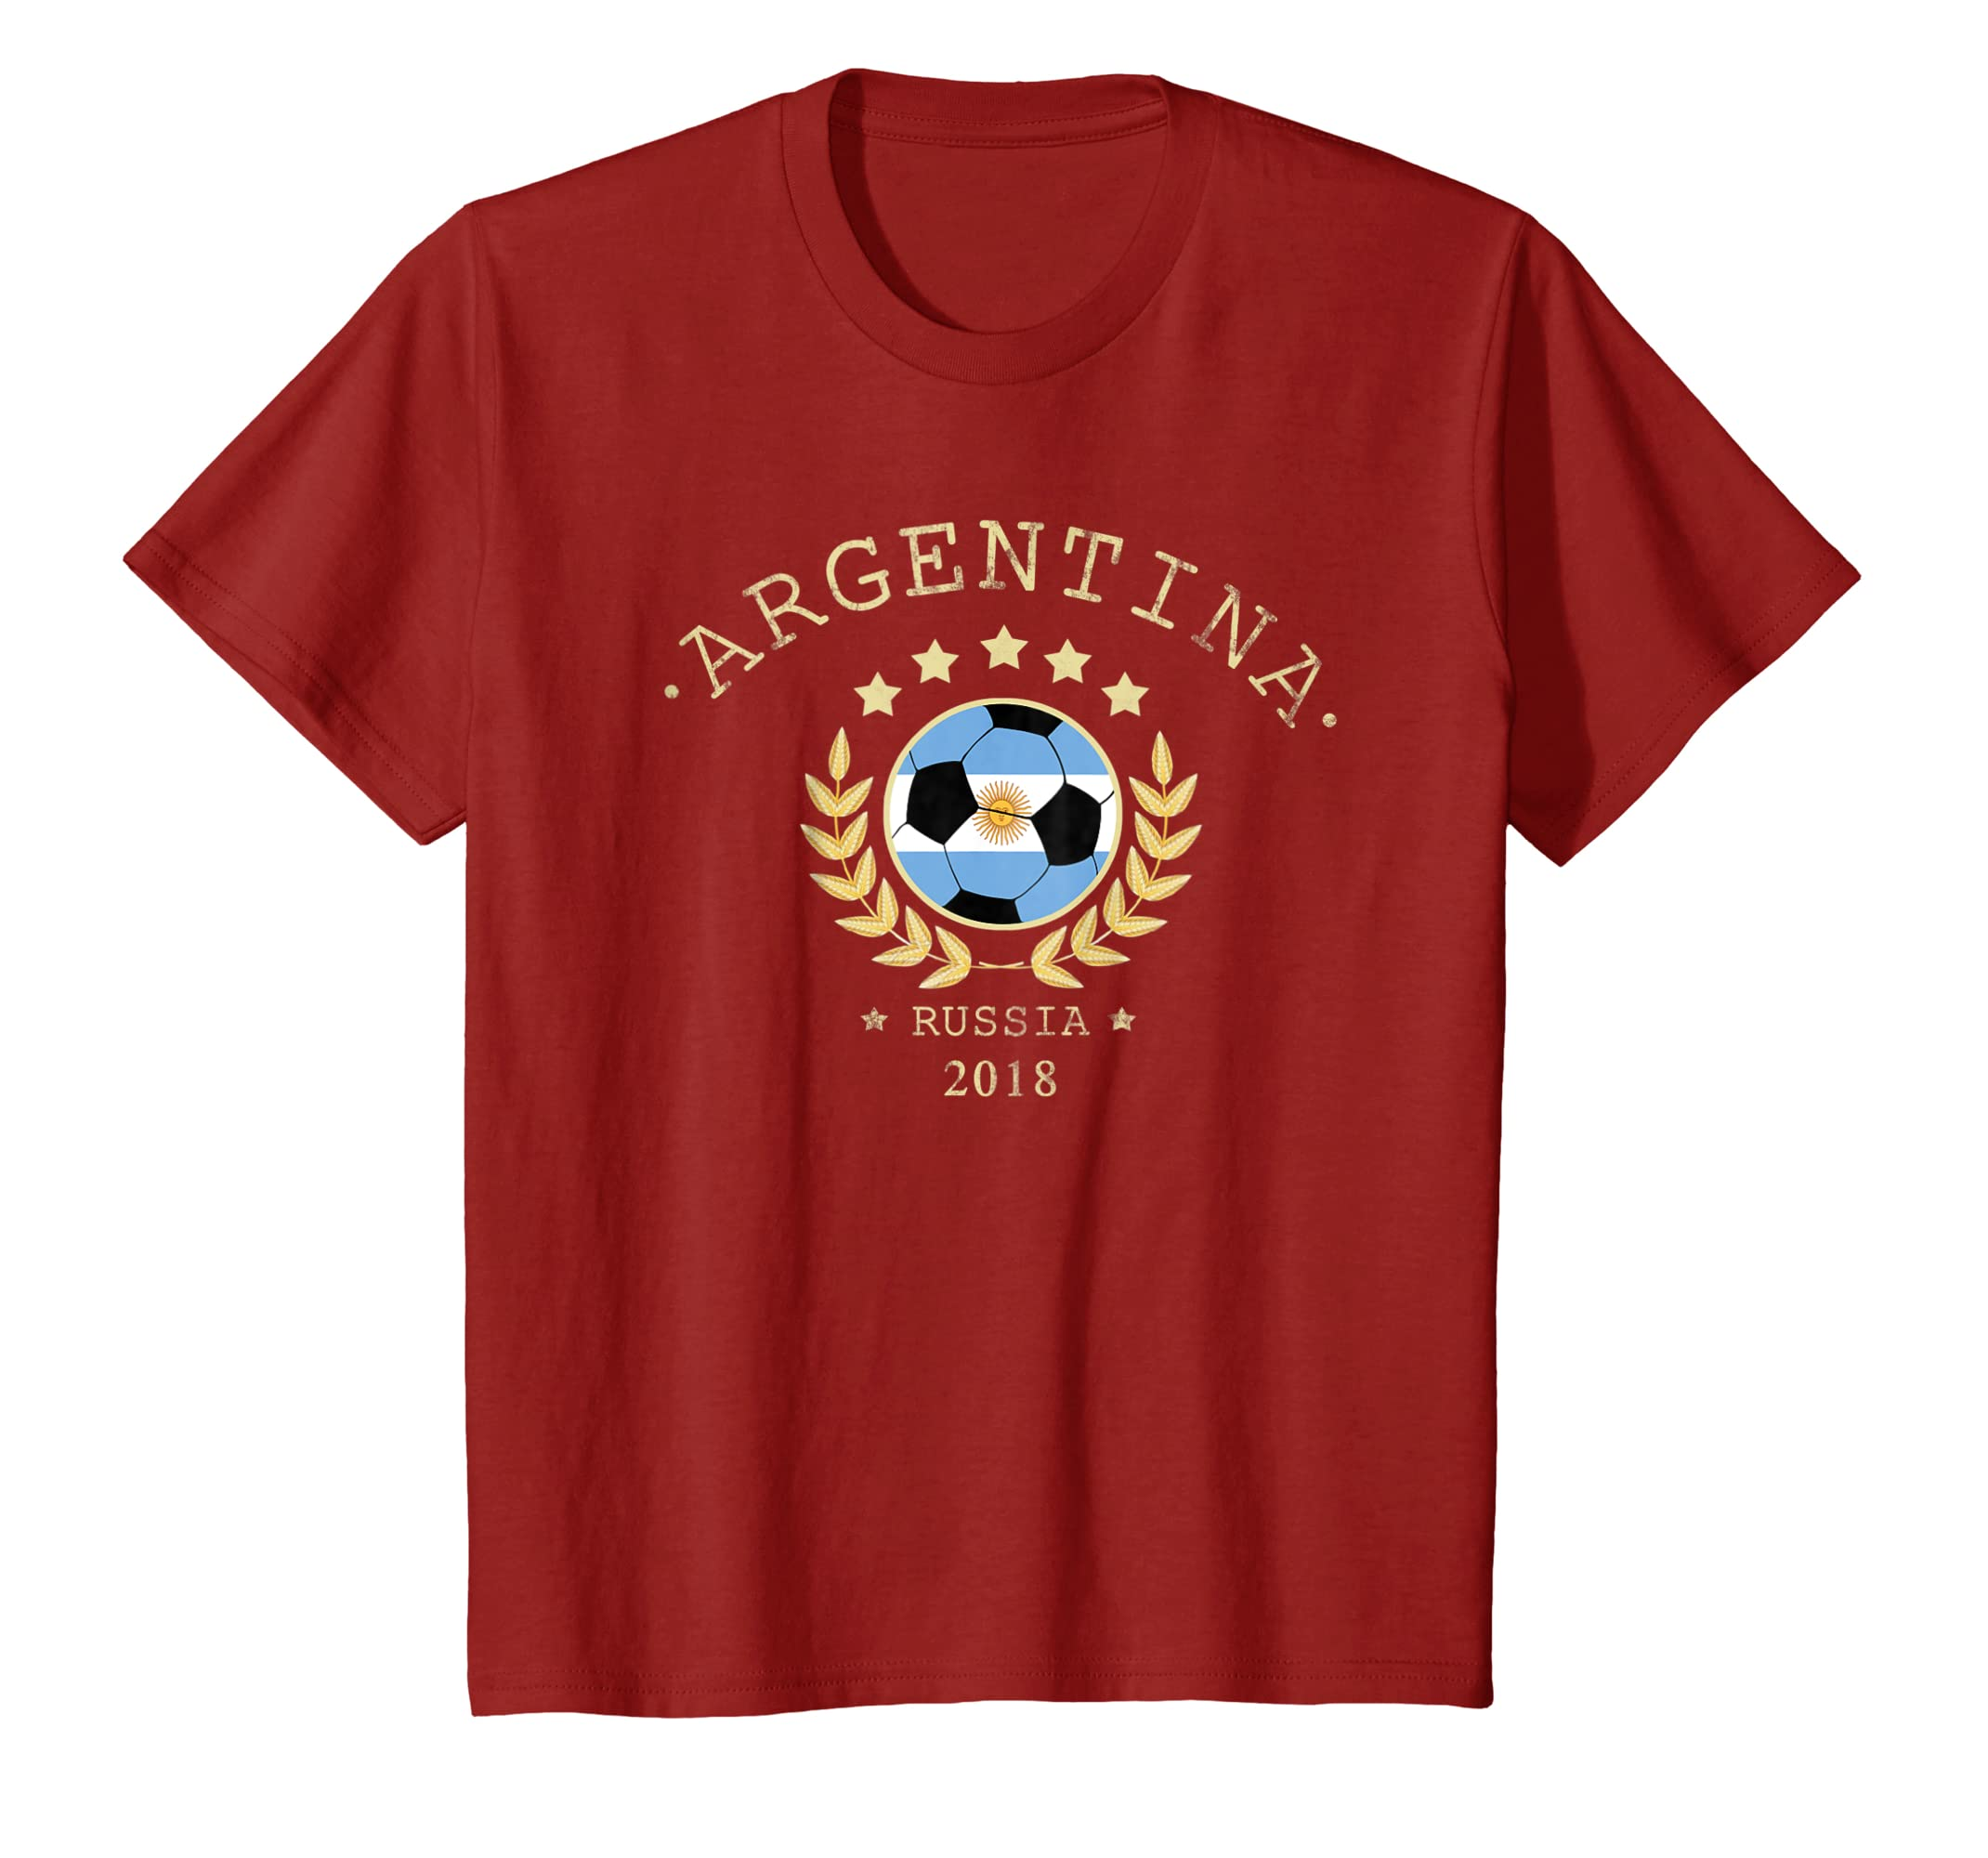 Amazon.com: Argentina T Shirt Russia Soccer Team 2018 Football T Shirt: Clothing